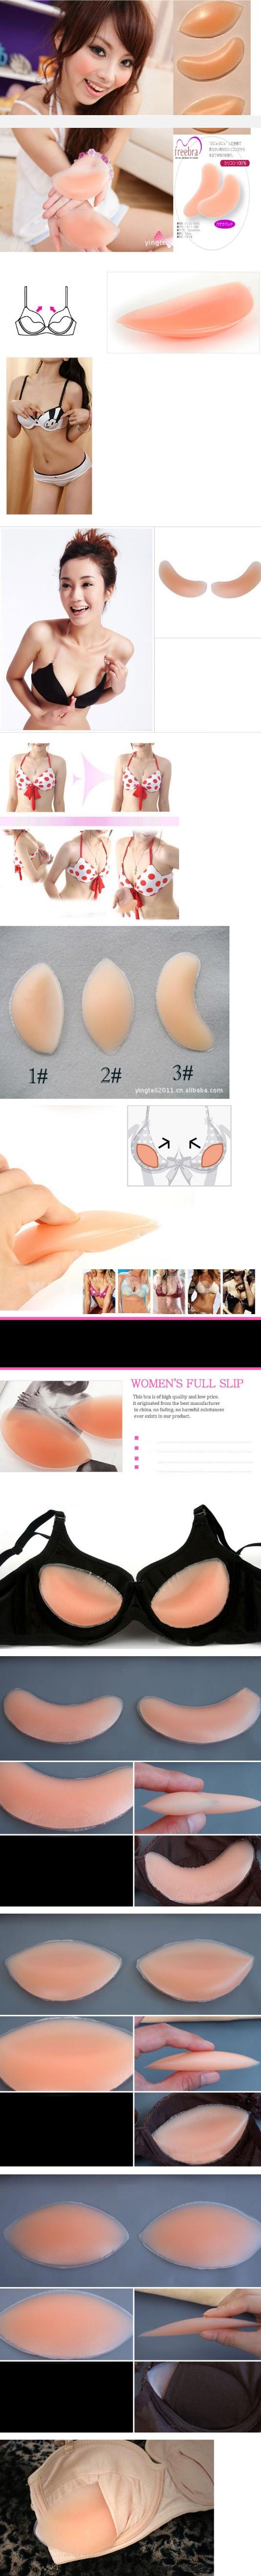 Invisible Nipple Pad